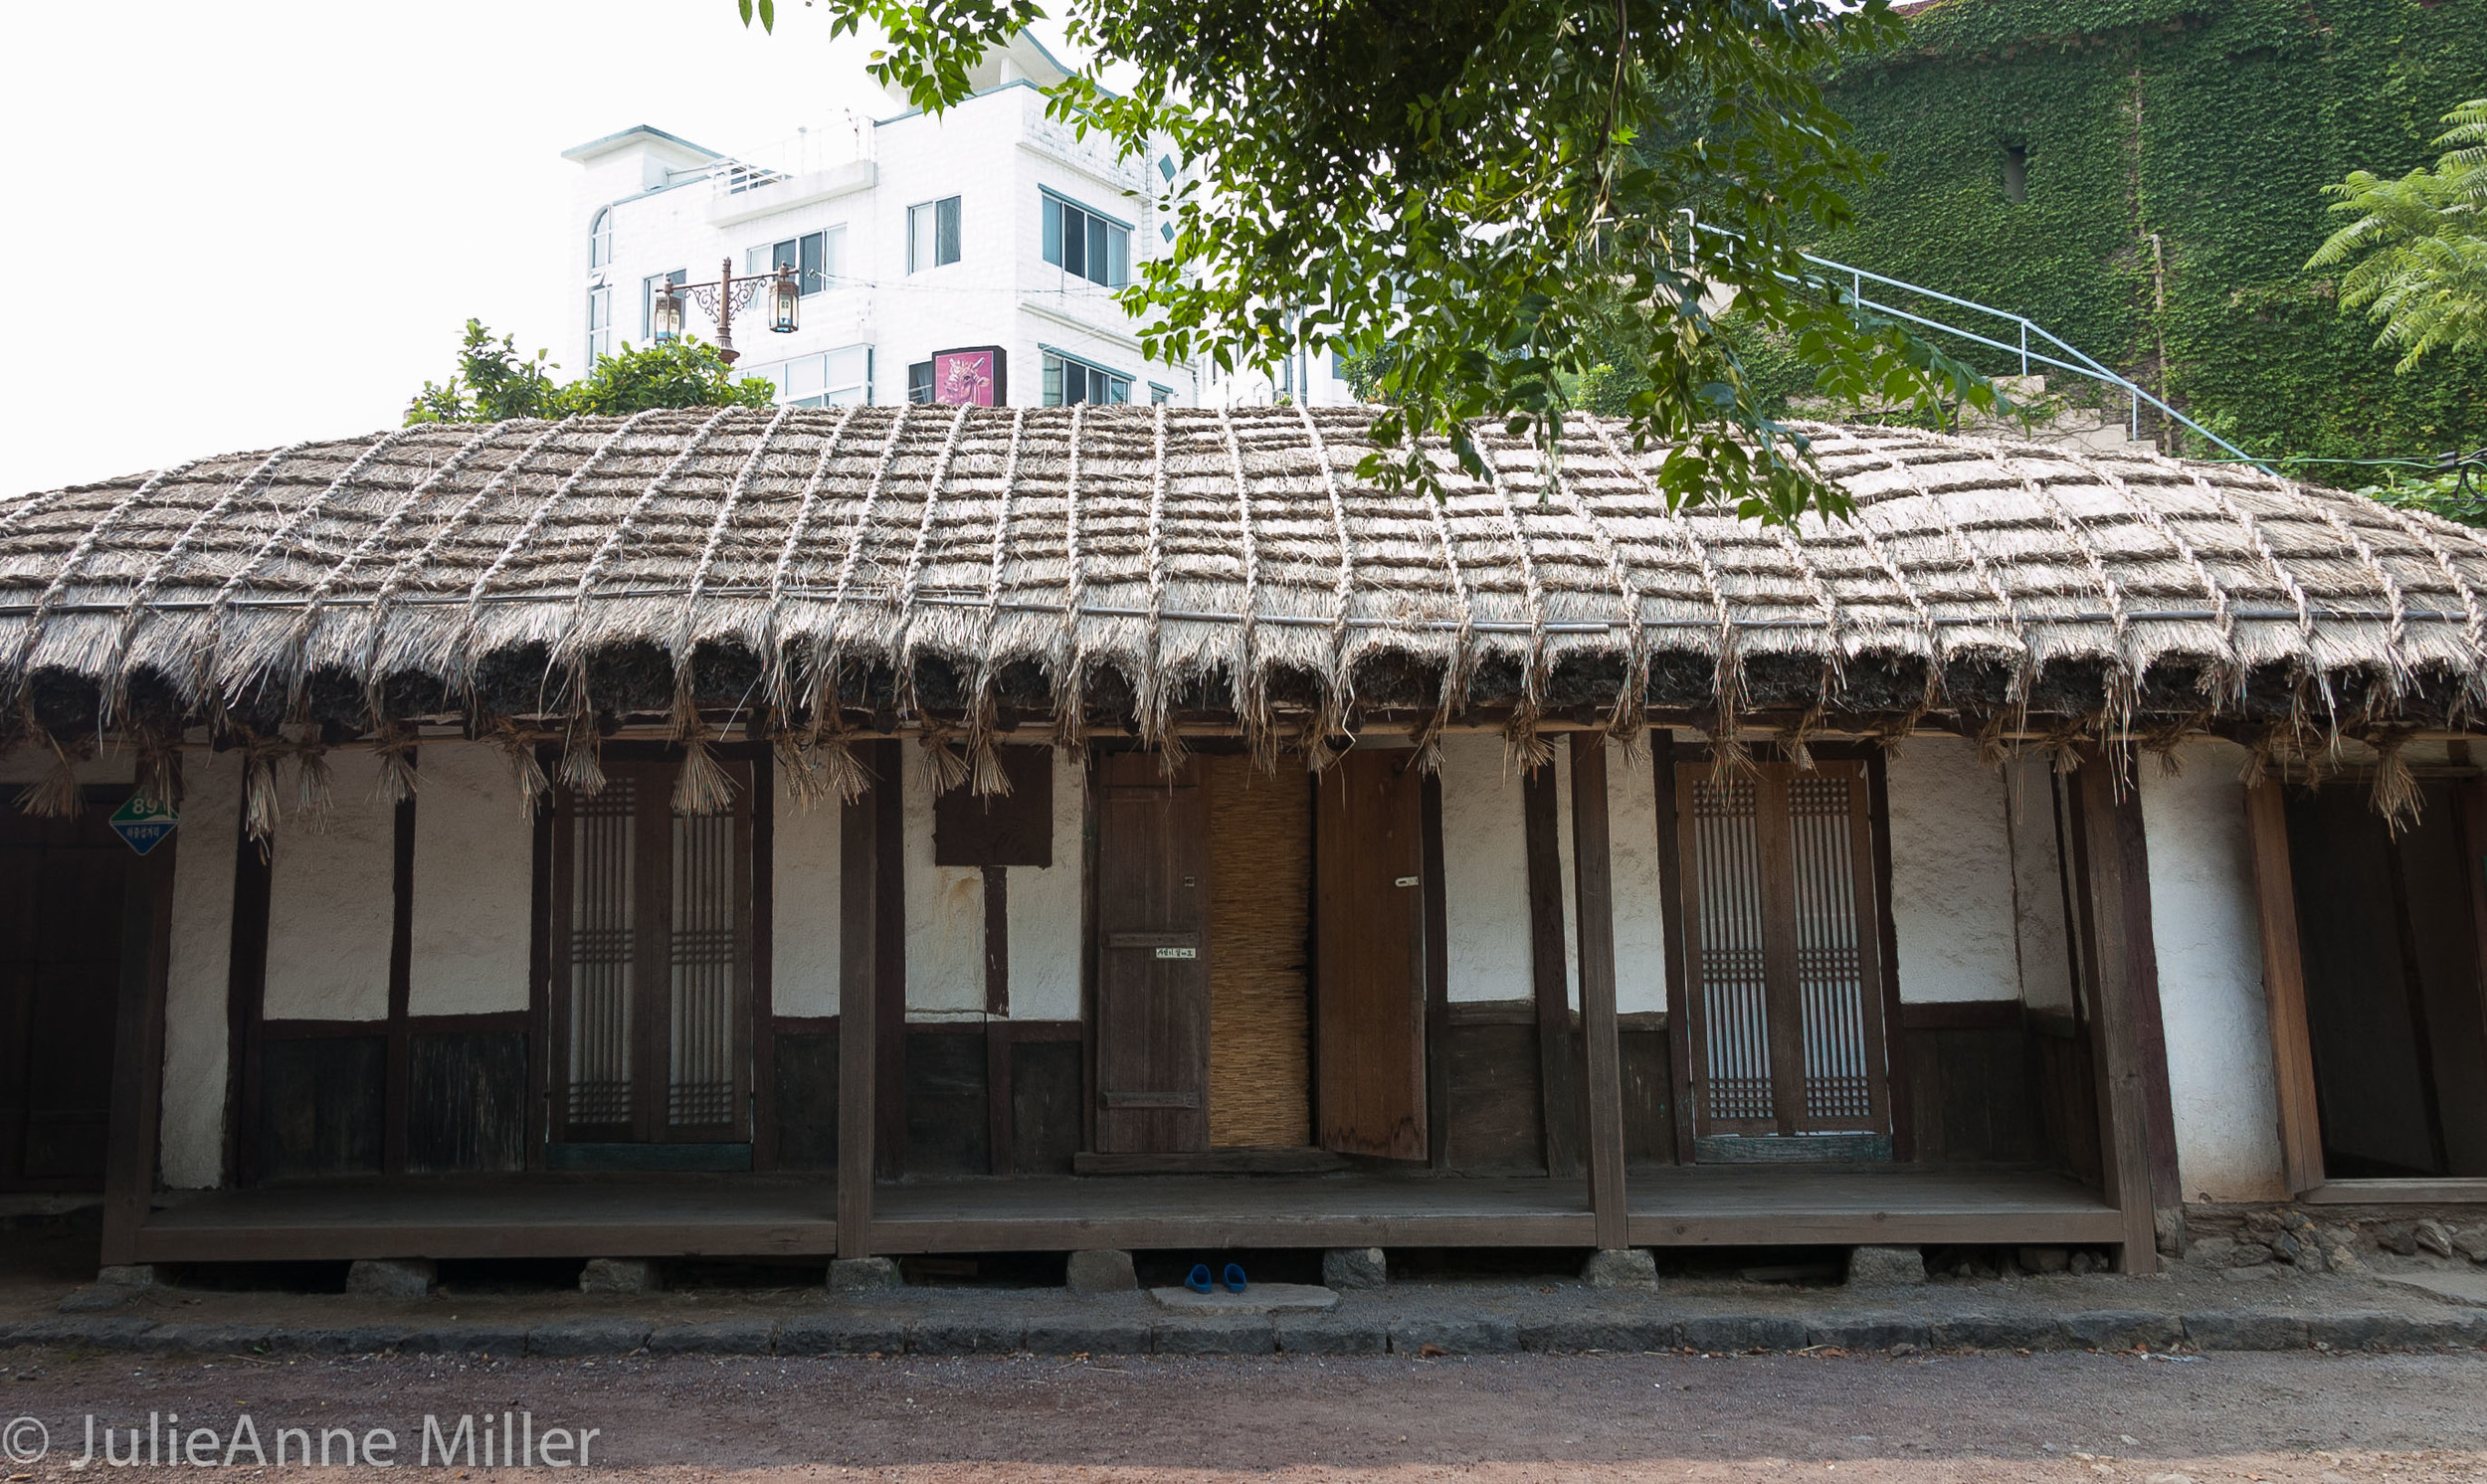 Home of artist Lee Joong Seop